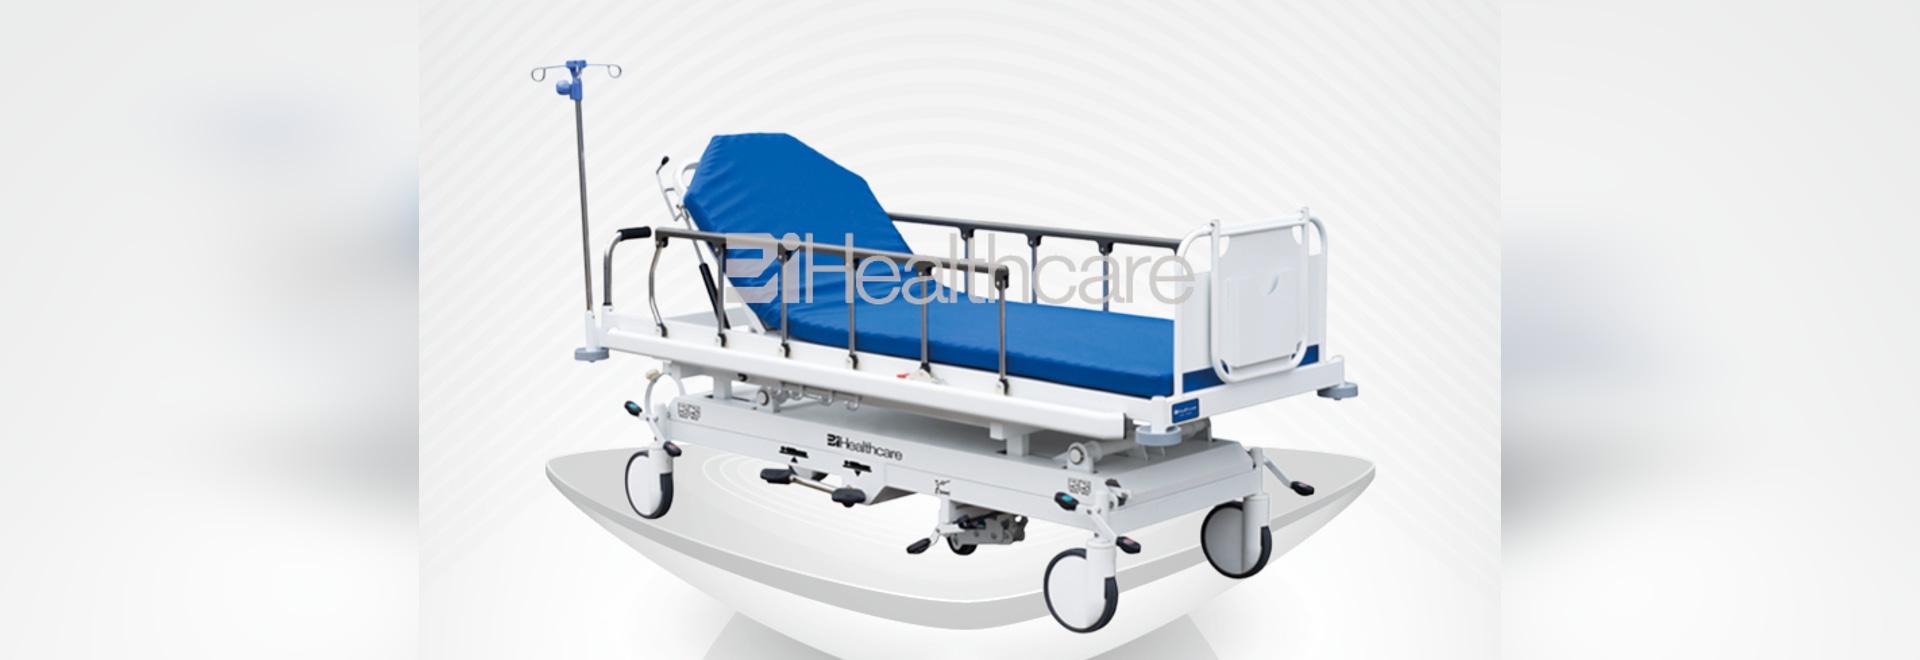 Hydraulic patient transportation stretcher